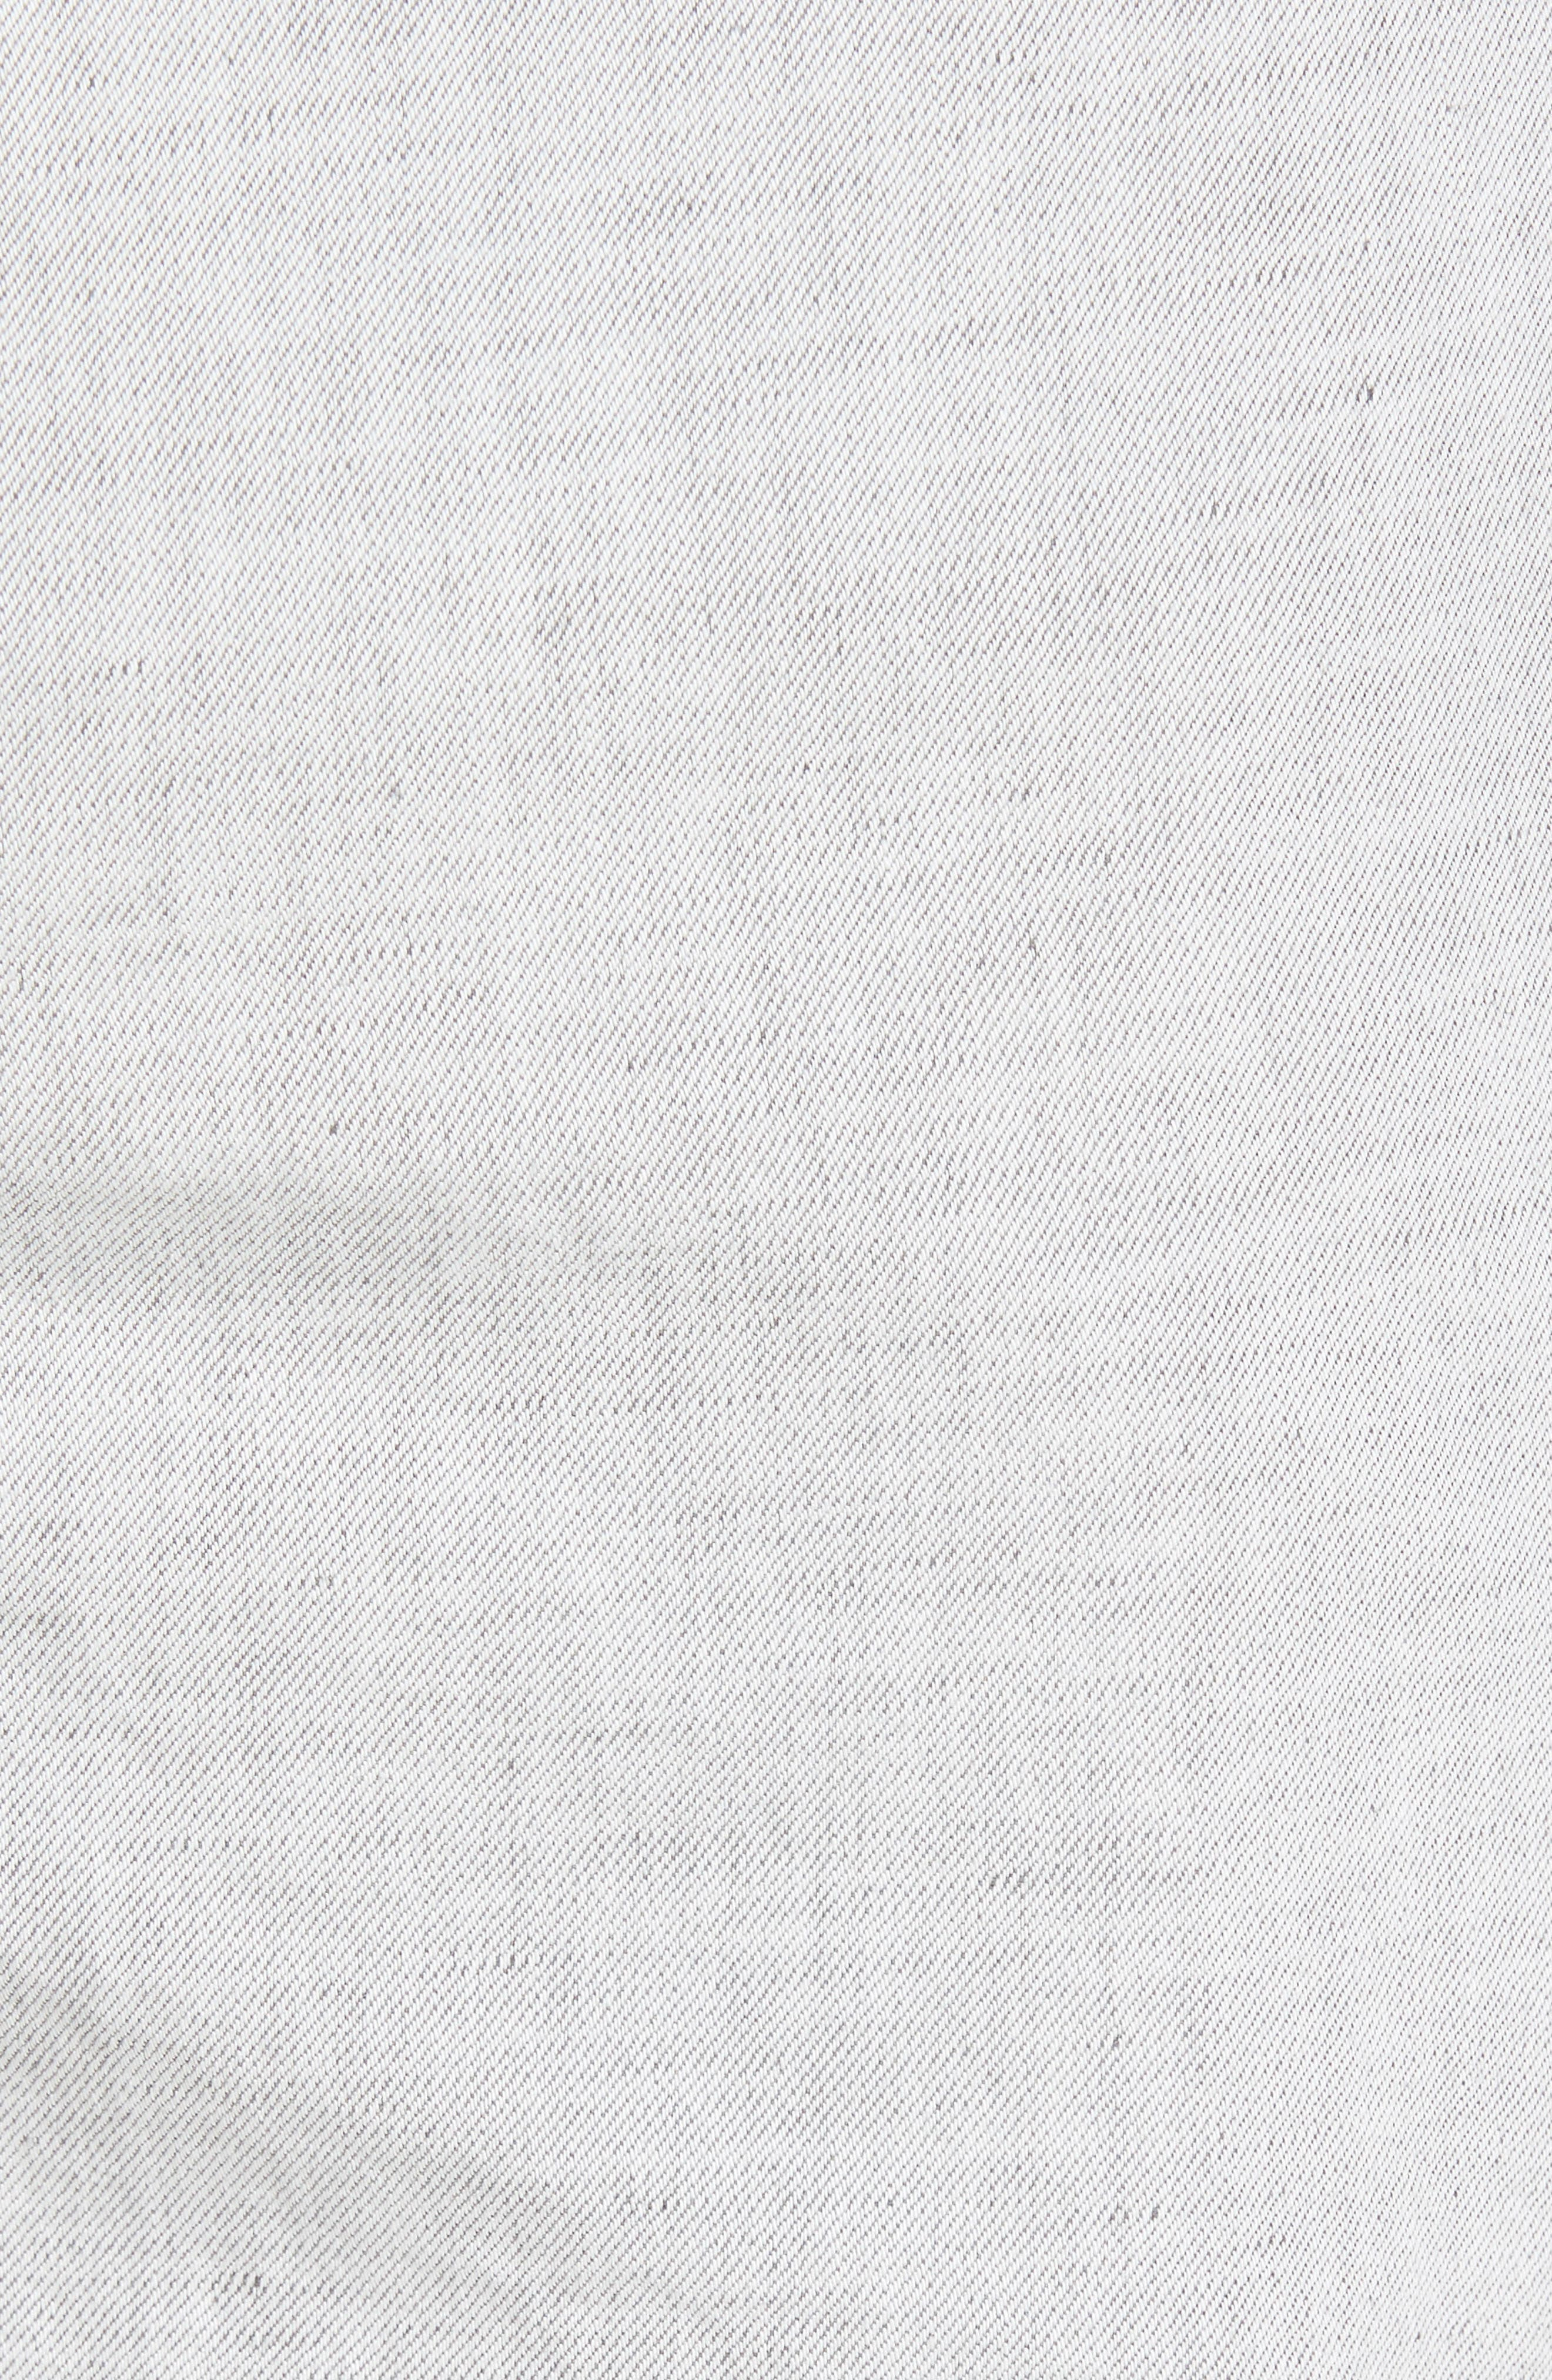 Frisho Cuff Denim Shorts,                             Alternate thumbnail 9, color,